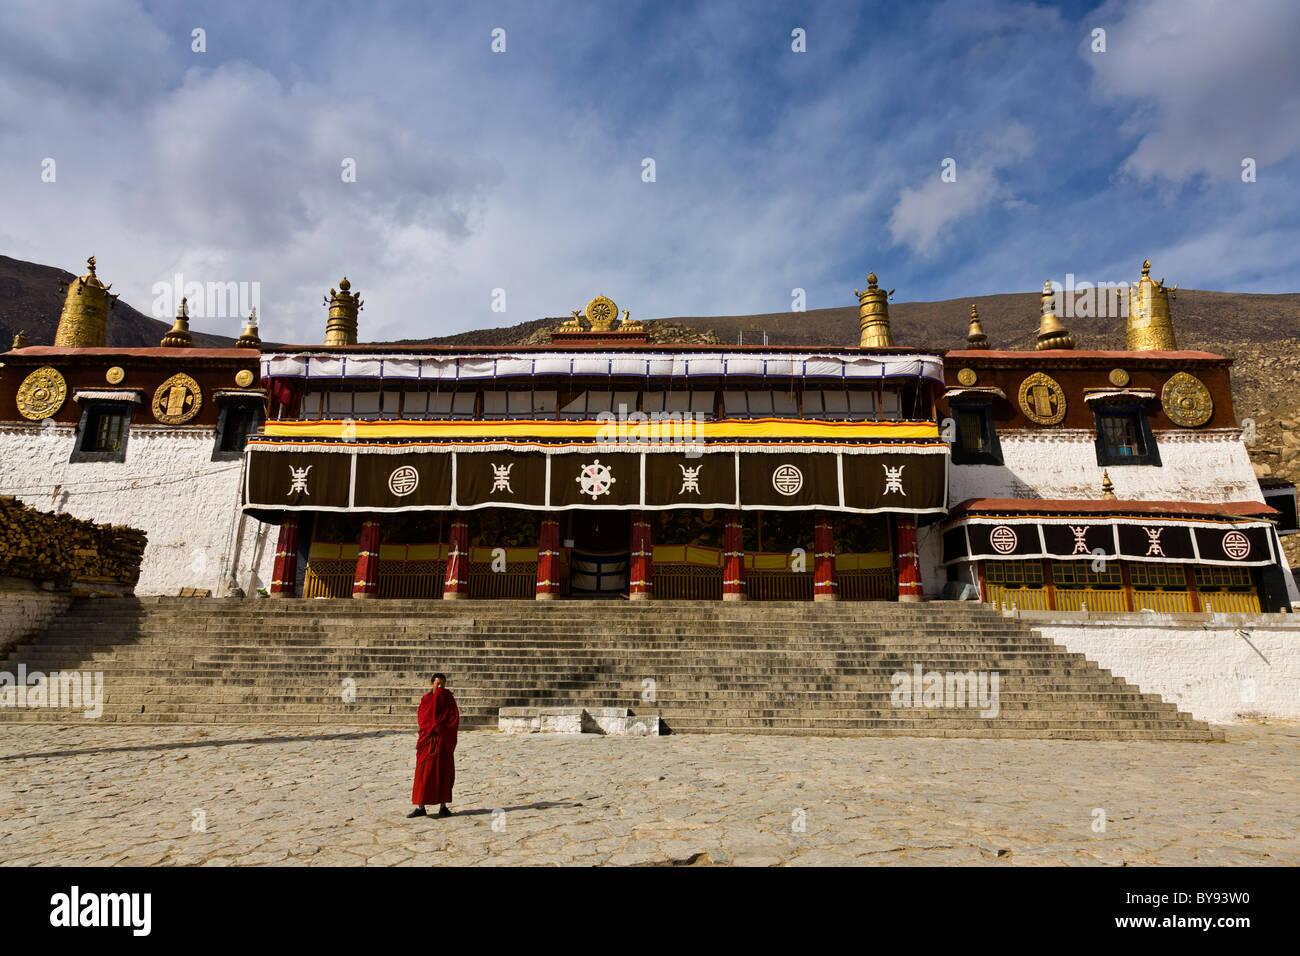 Monk outside Drepung Monastery, Lhasa, Tibet. JMH4540 - Stock Image